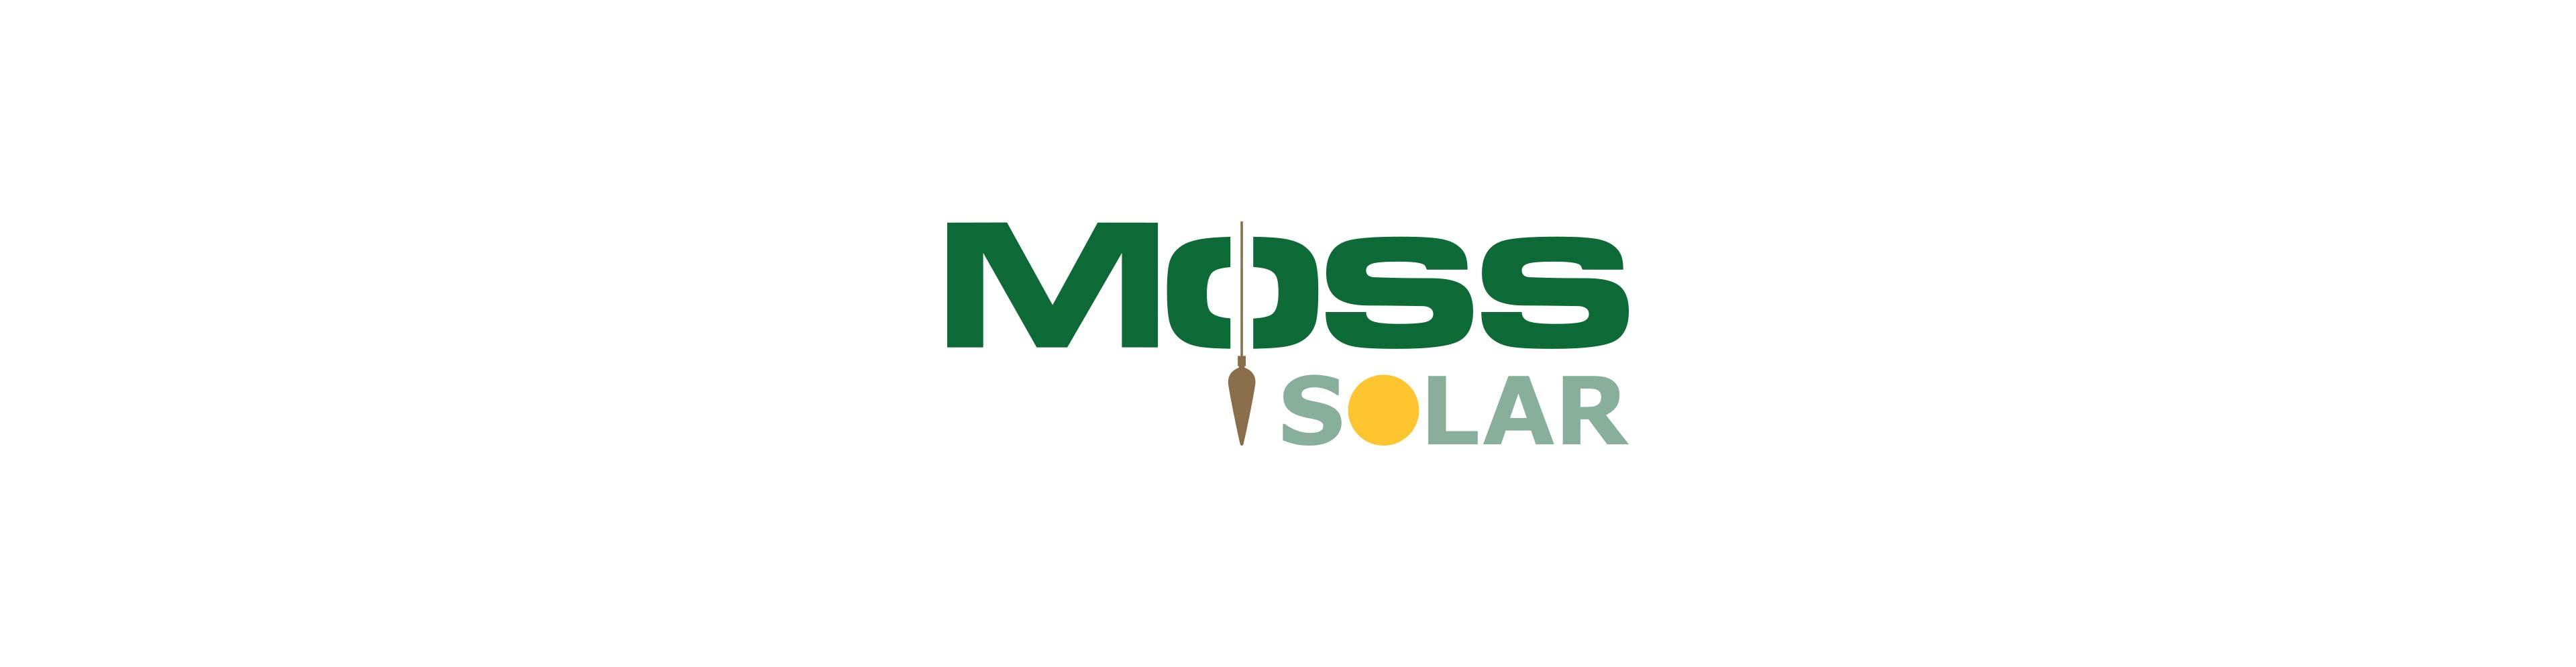 Moss Solar